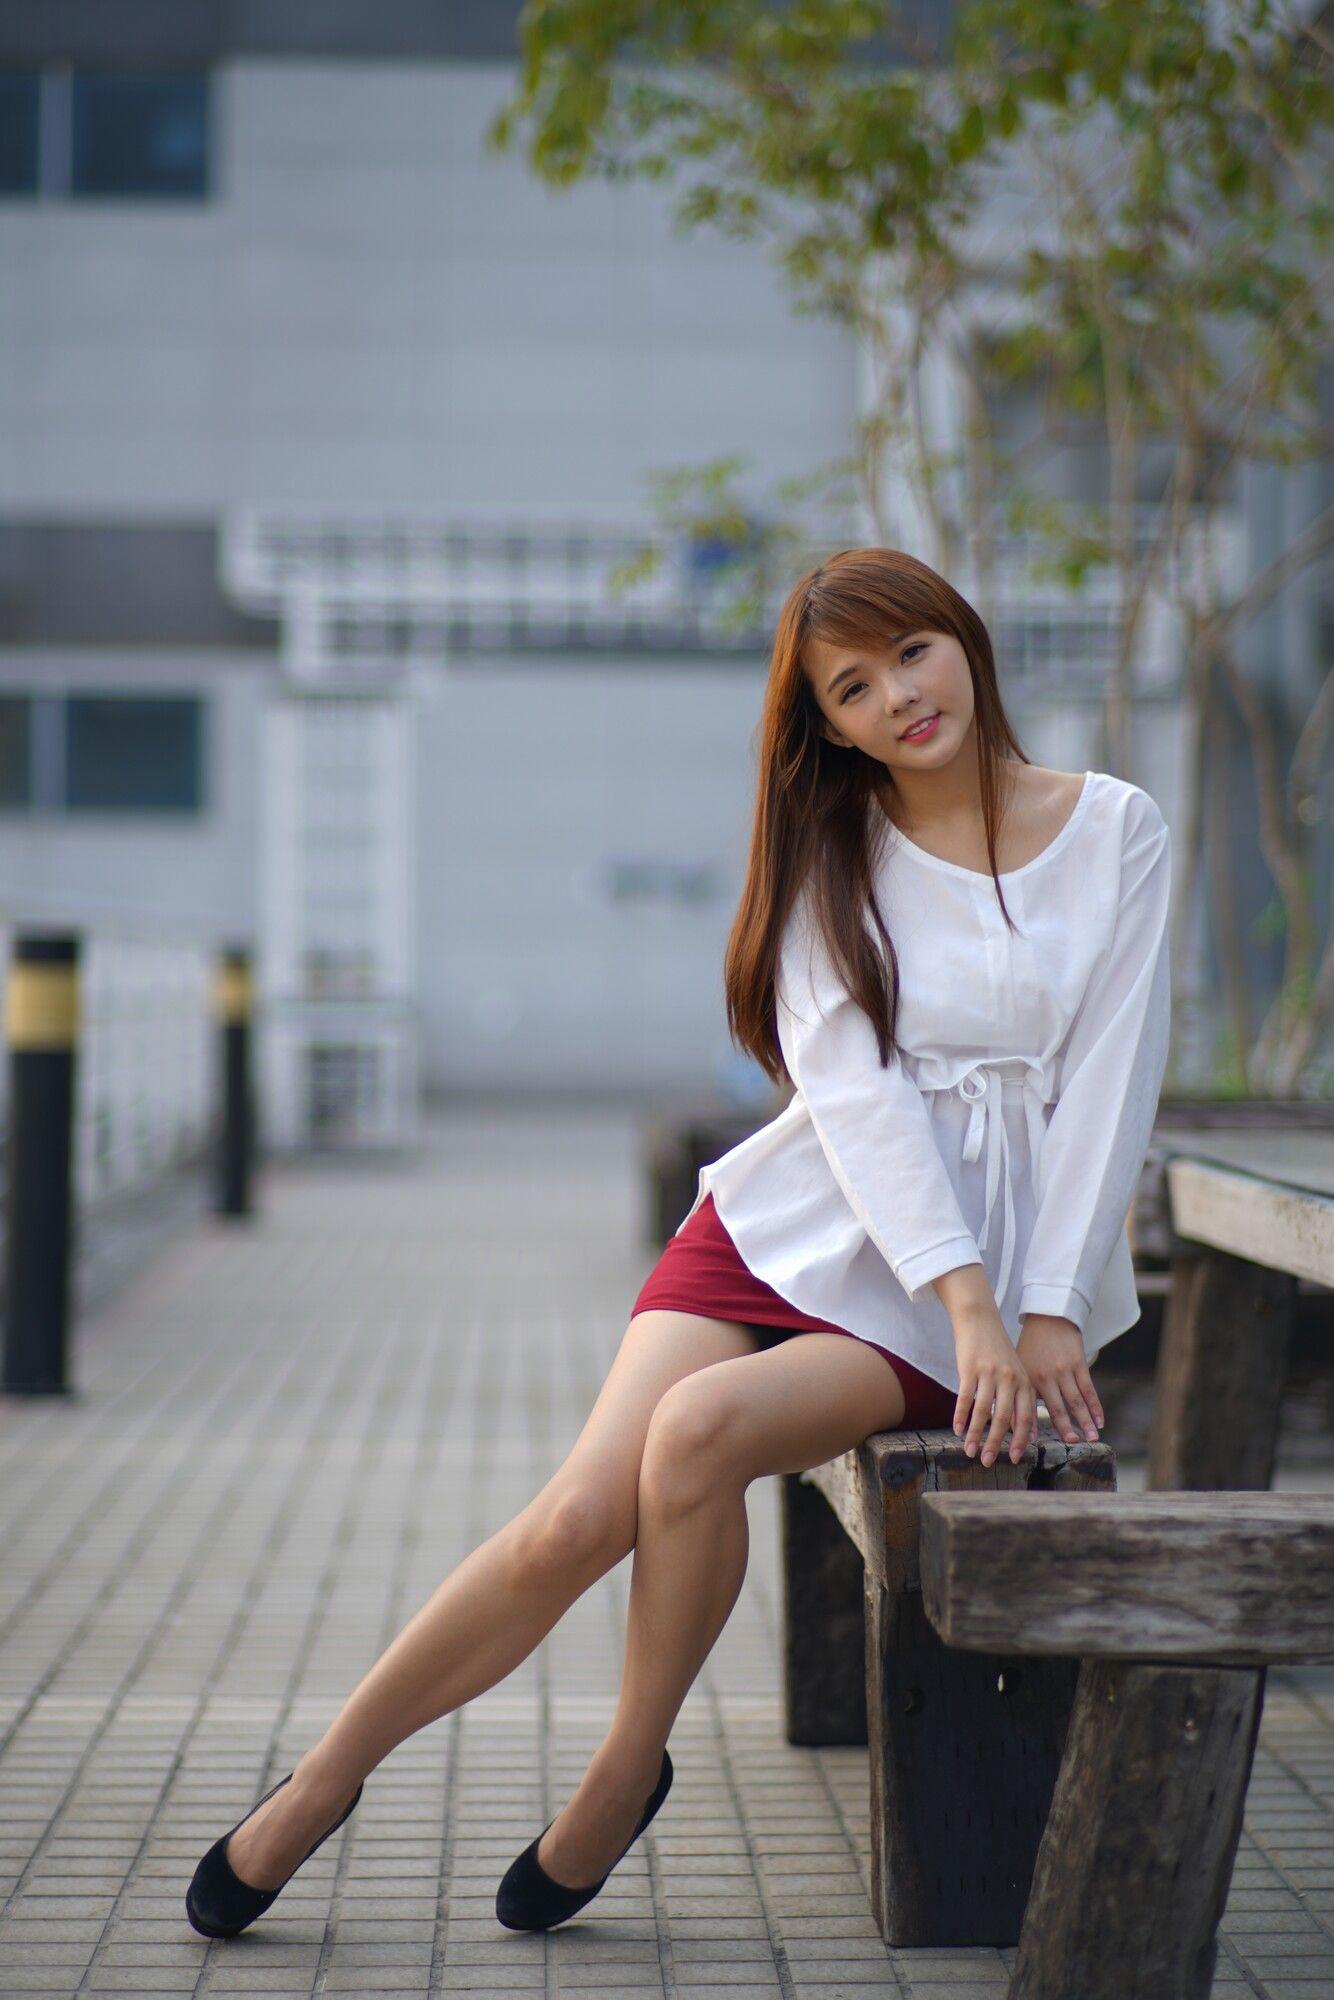 VOL.566 [台湾正妹]正妹包臀裙美女长腿美女街拍美臀:苏郁媛超高清个人性感漂亮大图(56P)